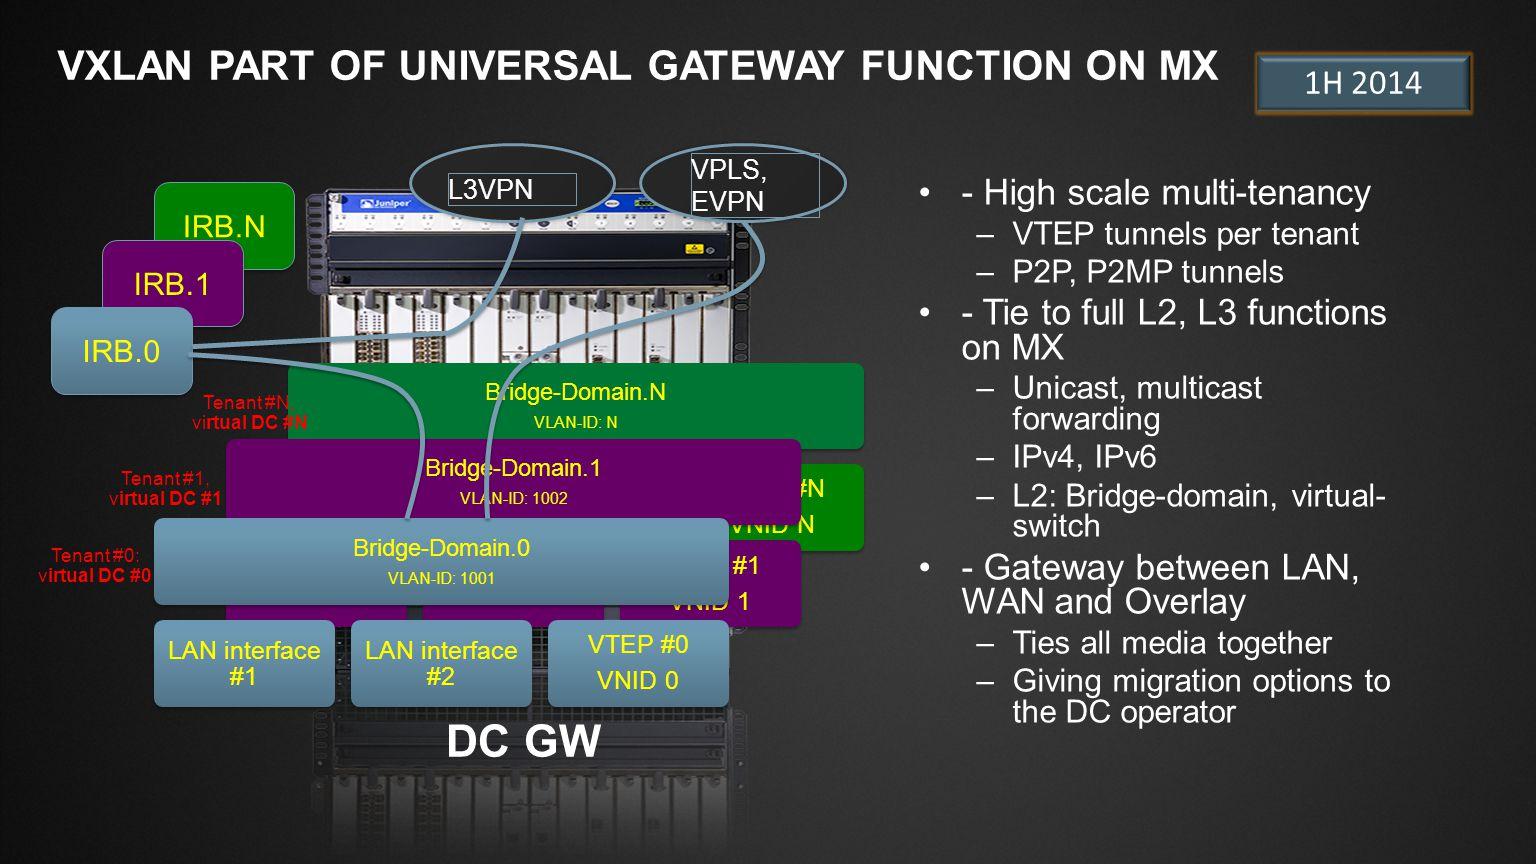 Slide Type Juniper Networks Large Venue Template / 16x9 / V6 Blank SlideTitle and Content 1-Line USG (Universal SDN Gateway) USG (Universal SDN Gateway) Bare Metal Servers Databases HPC Legacy Apps Non x86 IP Storage Firewalls Load Balancers NAT Intrusion Detection VPN Concentrator L4 – 7 Appliances NSX ESXi NSX KVM SC HyperV Contrail KVM Contrail ZEN SDN Servers Virtualized Servers ESX ESXi HyperV KVM ZEN NETWORK DEVICES IN THE DATA CENTER